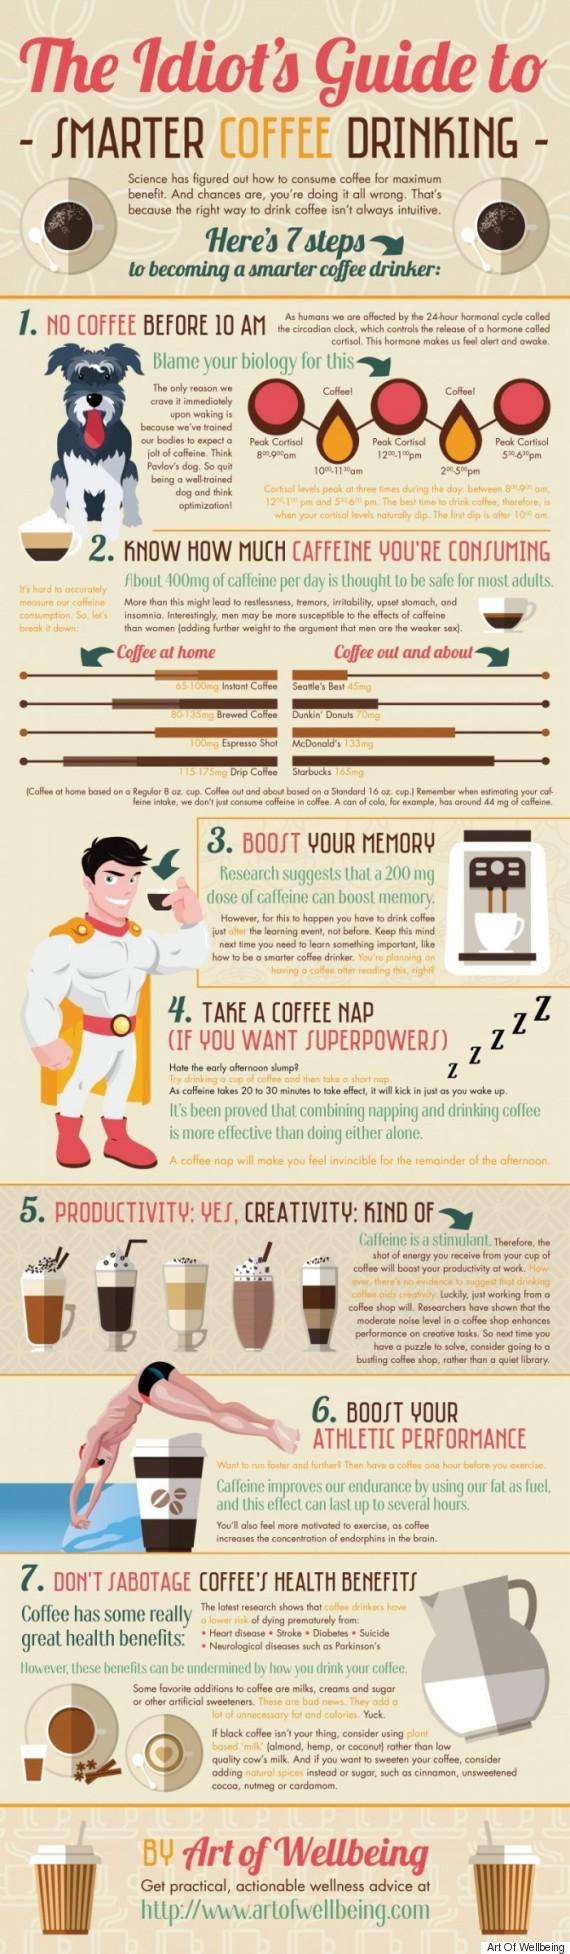 o-coffee-benefits-570